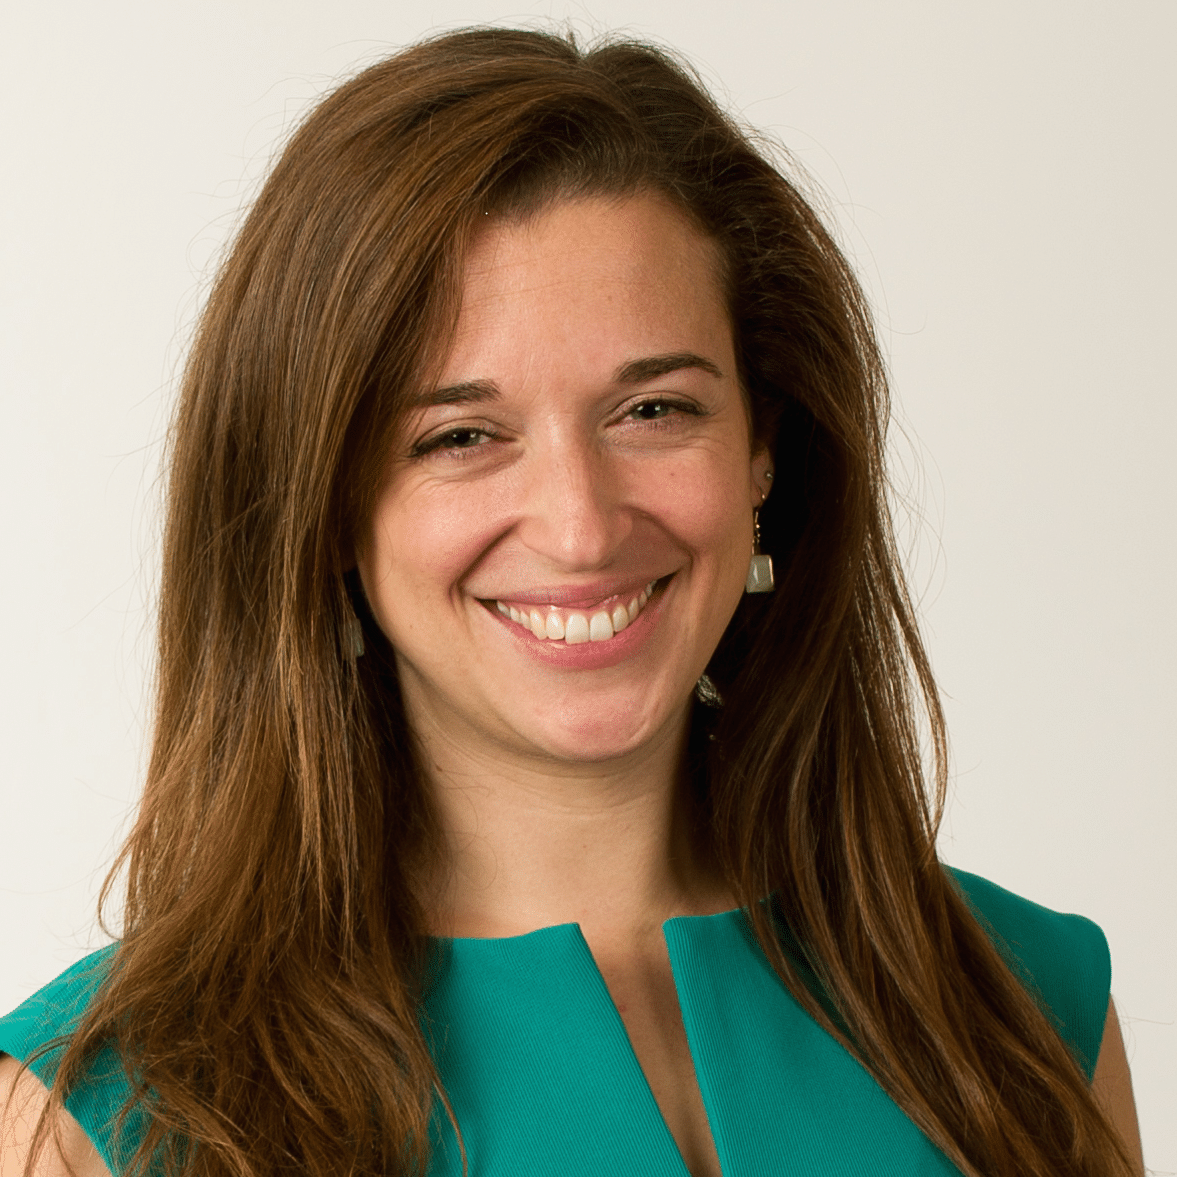 Dr-Emily-Grossman-scientist-molecular-biologist-speaker-at-Great-British-Speakers